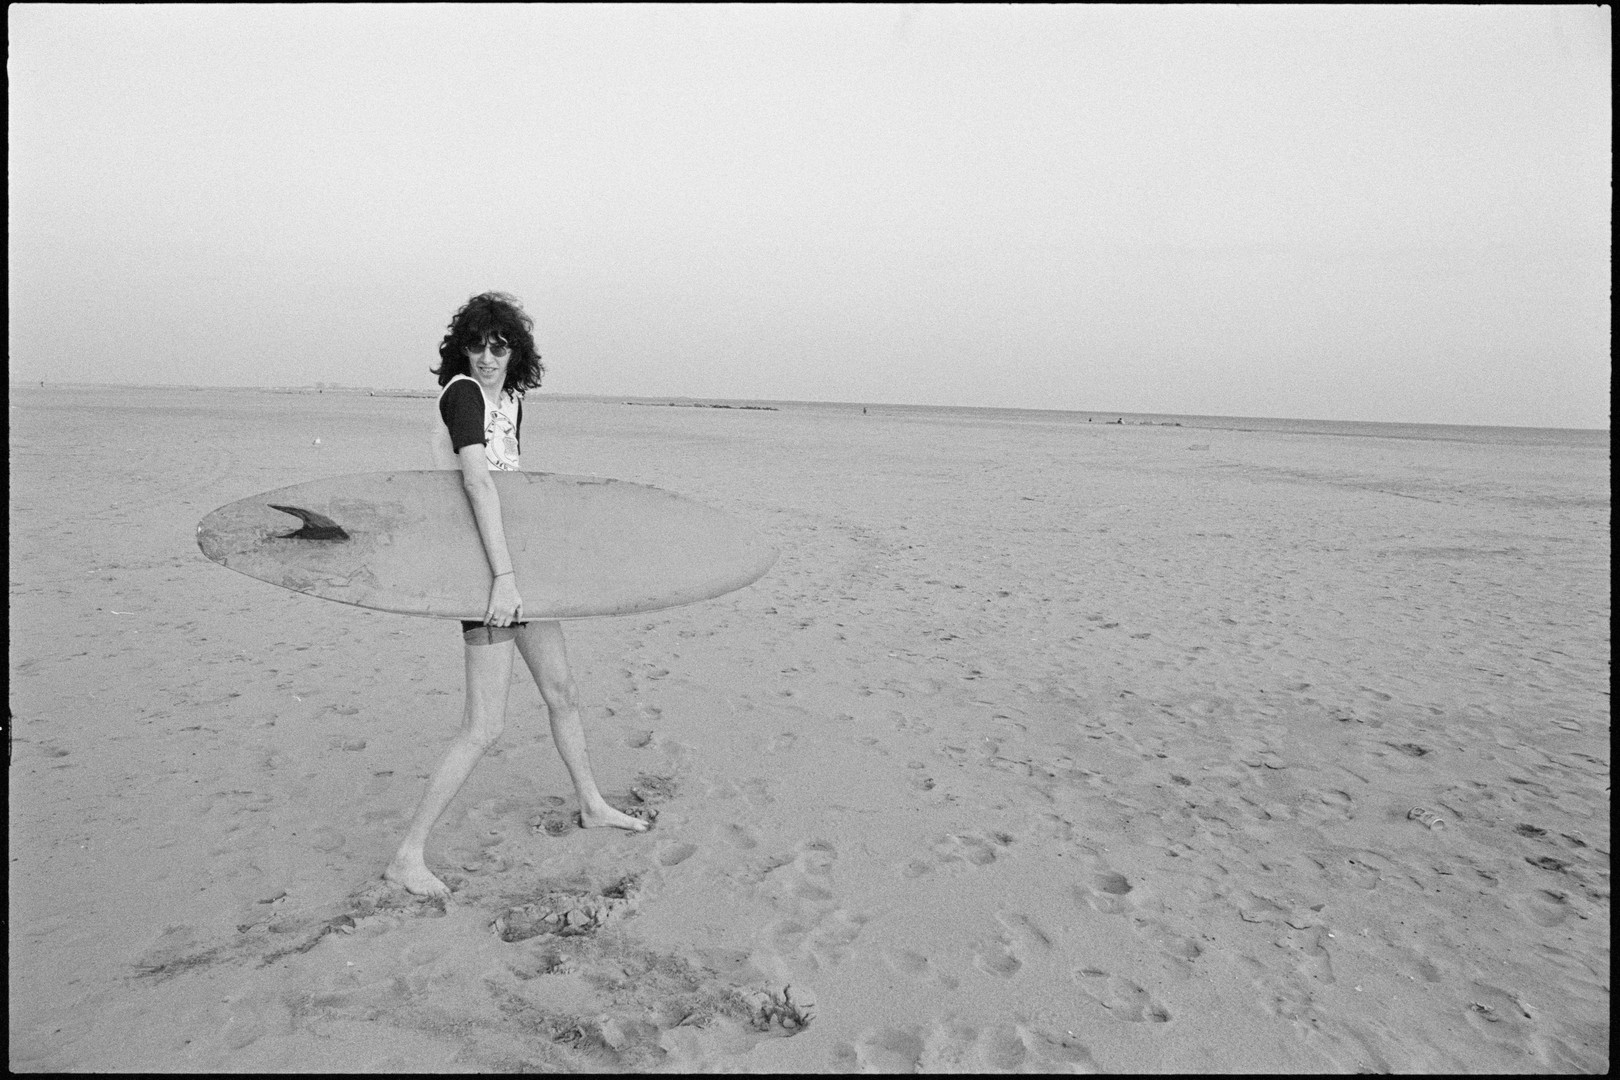 Joey Ramone. Coney Island, 1977